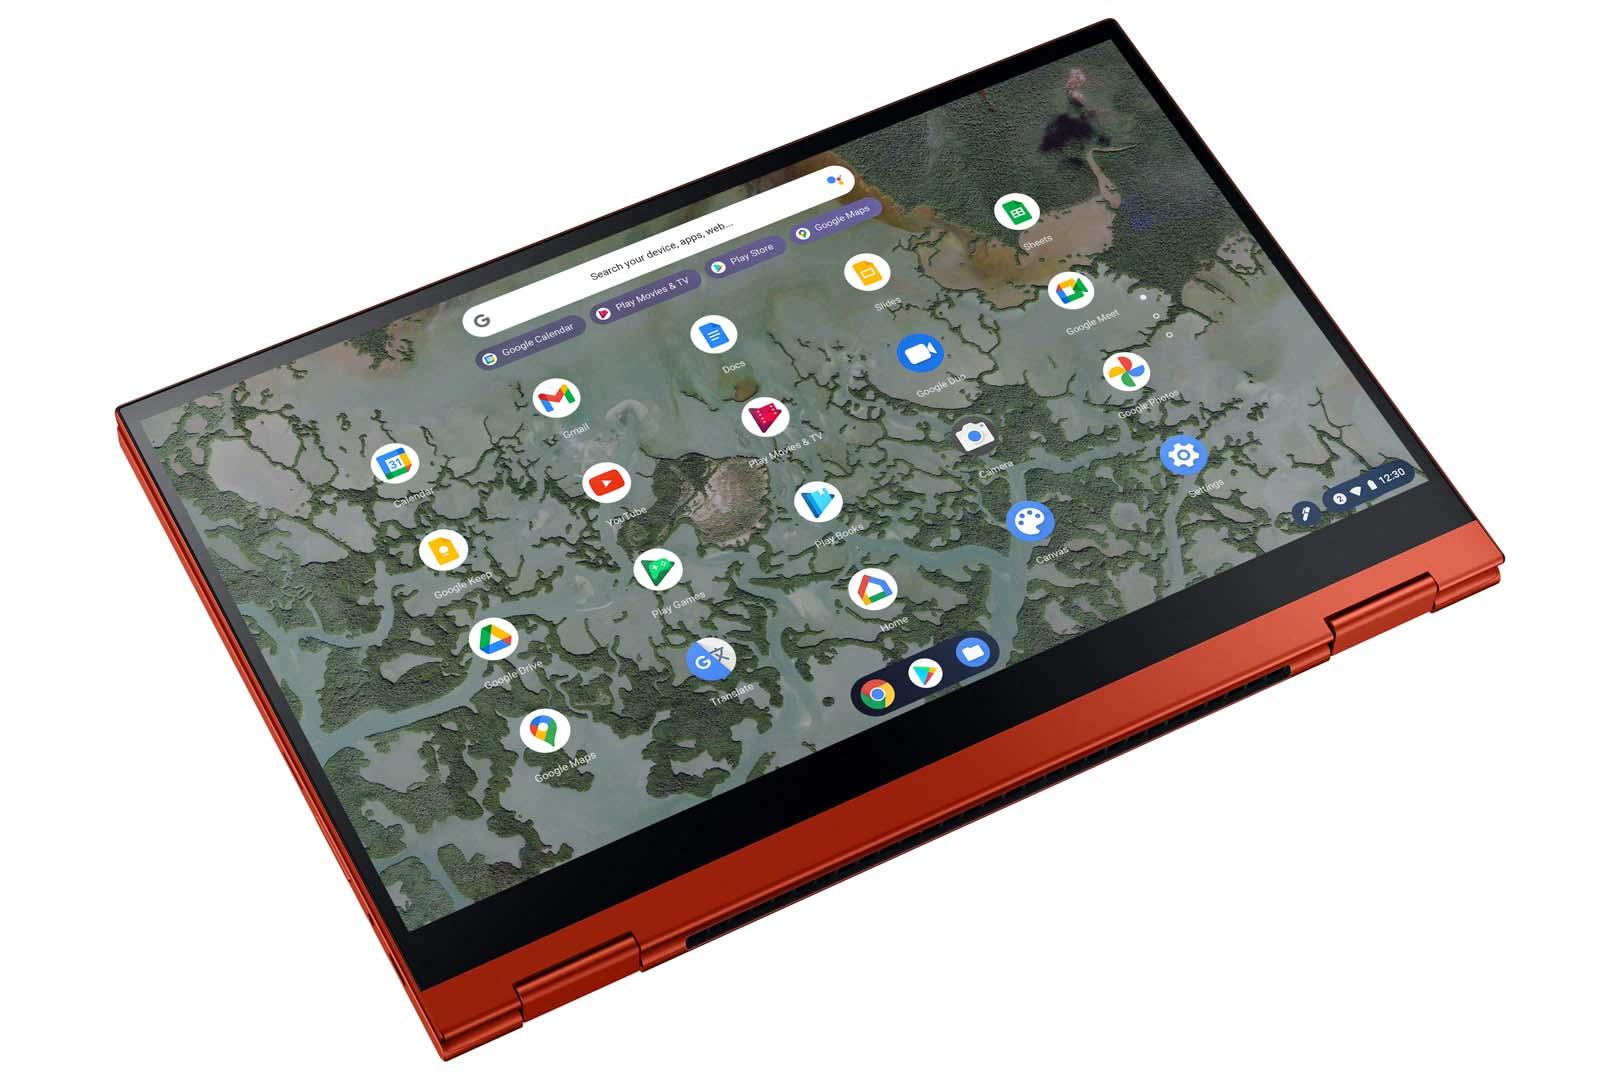 Galaxy Chromeook 2